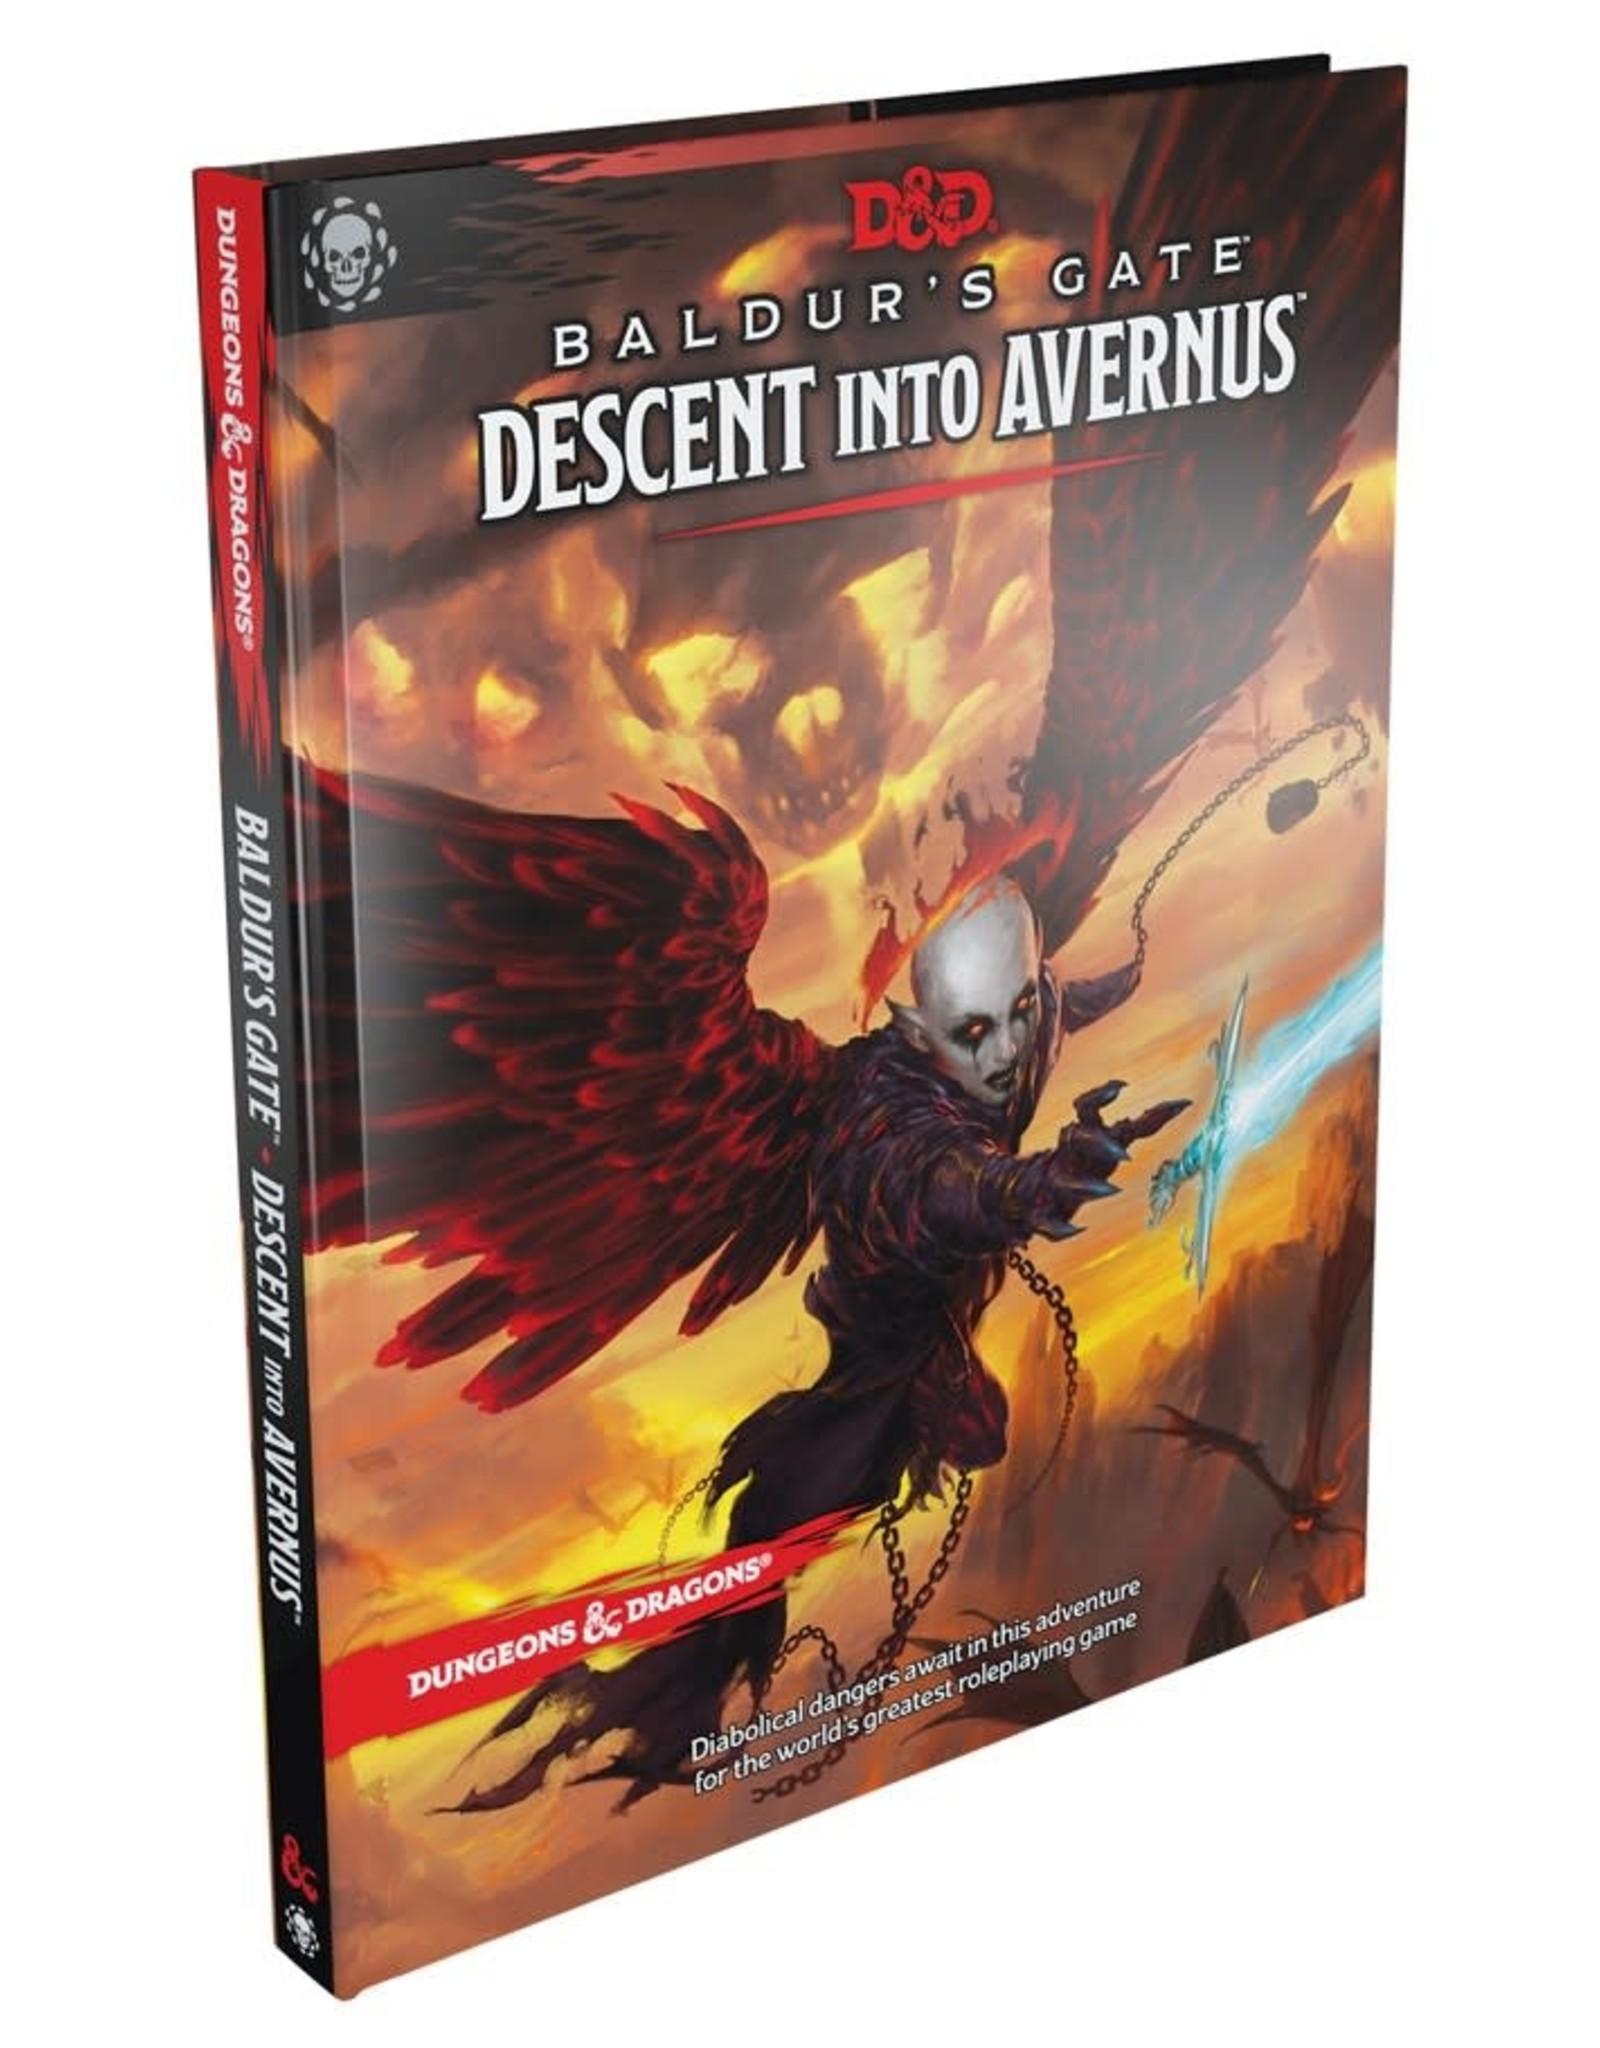 WOTC D&D: Baldur's Gate Descent Into Avernus Book